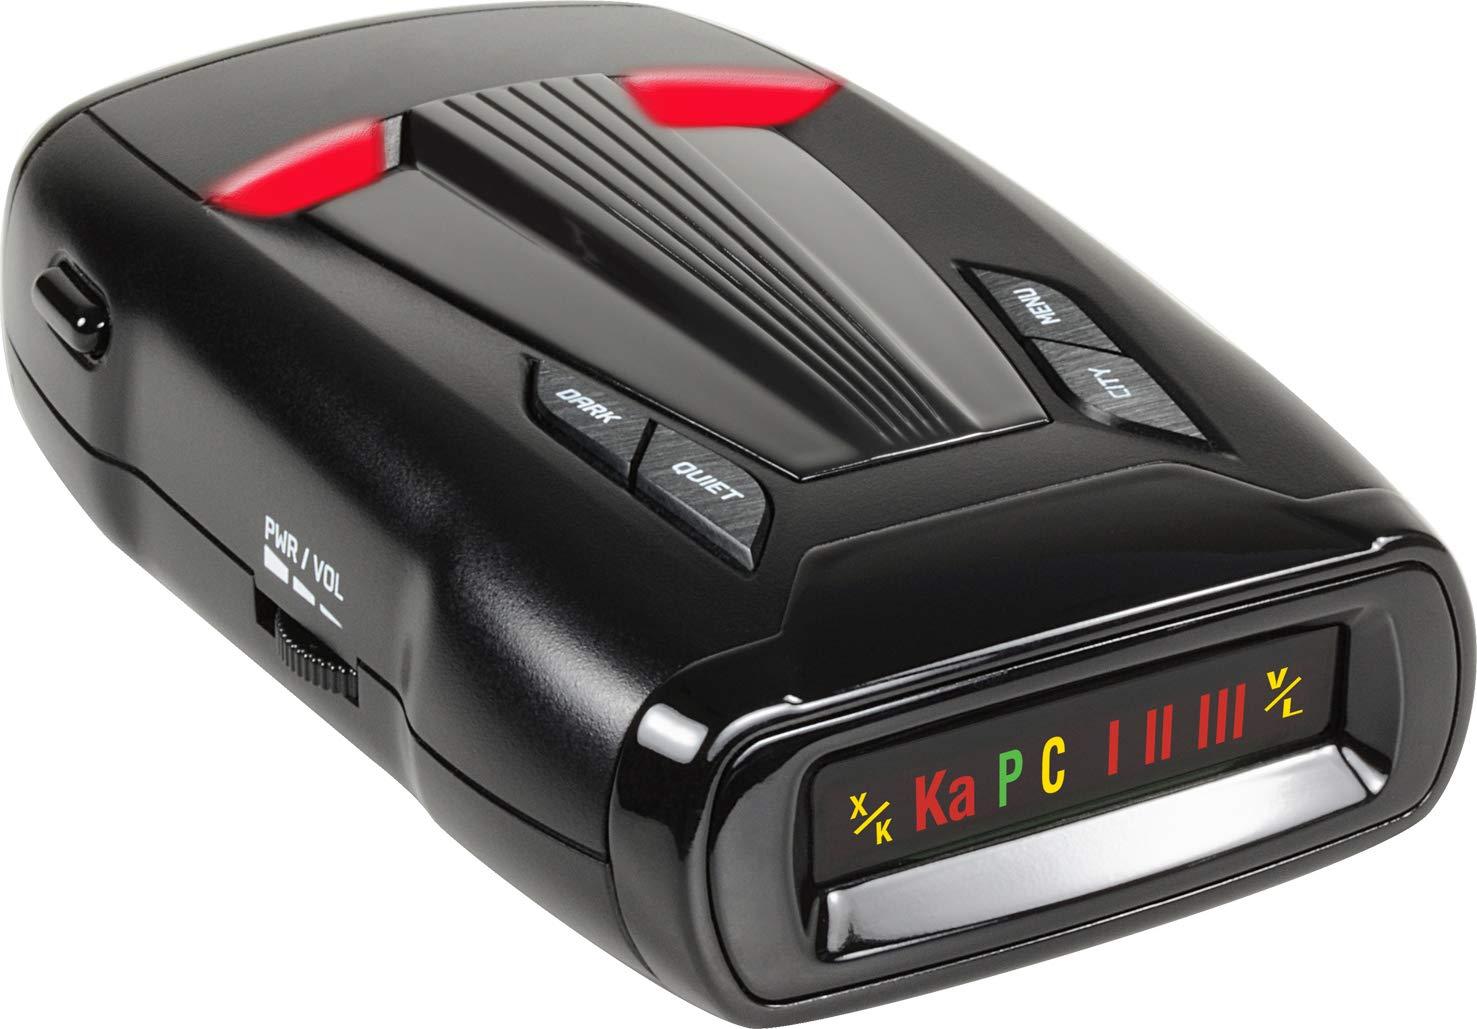 CR68 Laser/Radar Detector